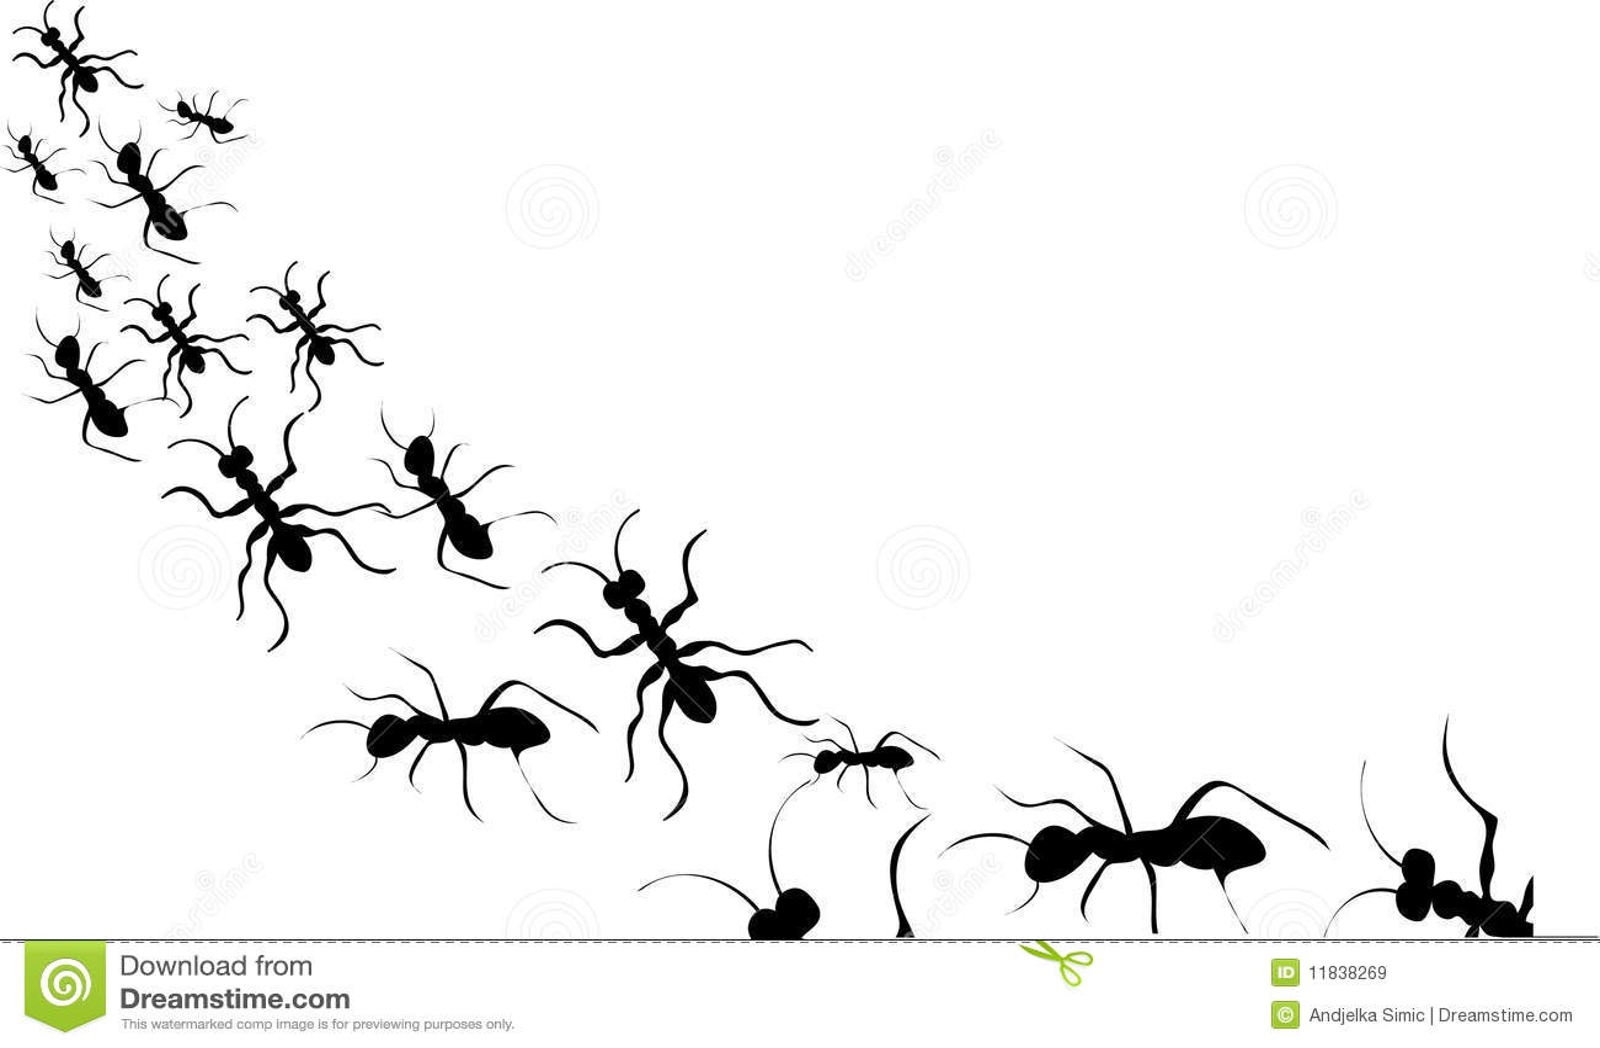 Ants Black Silhouette ...